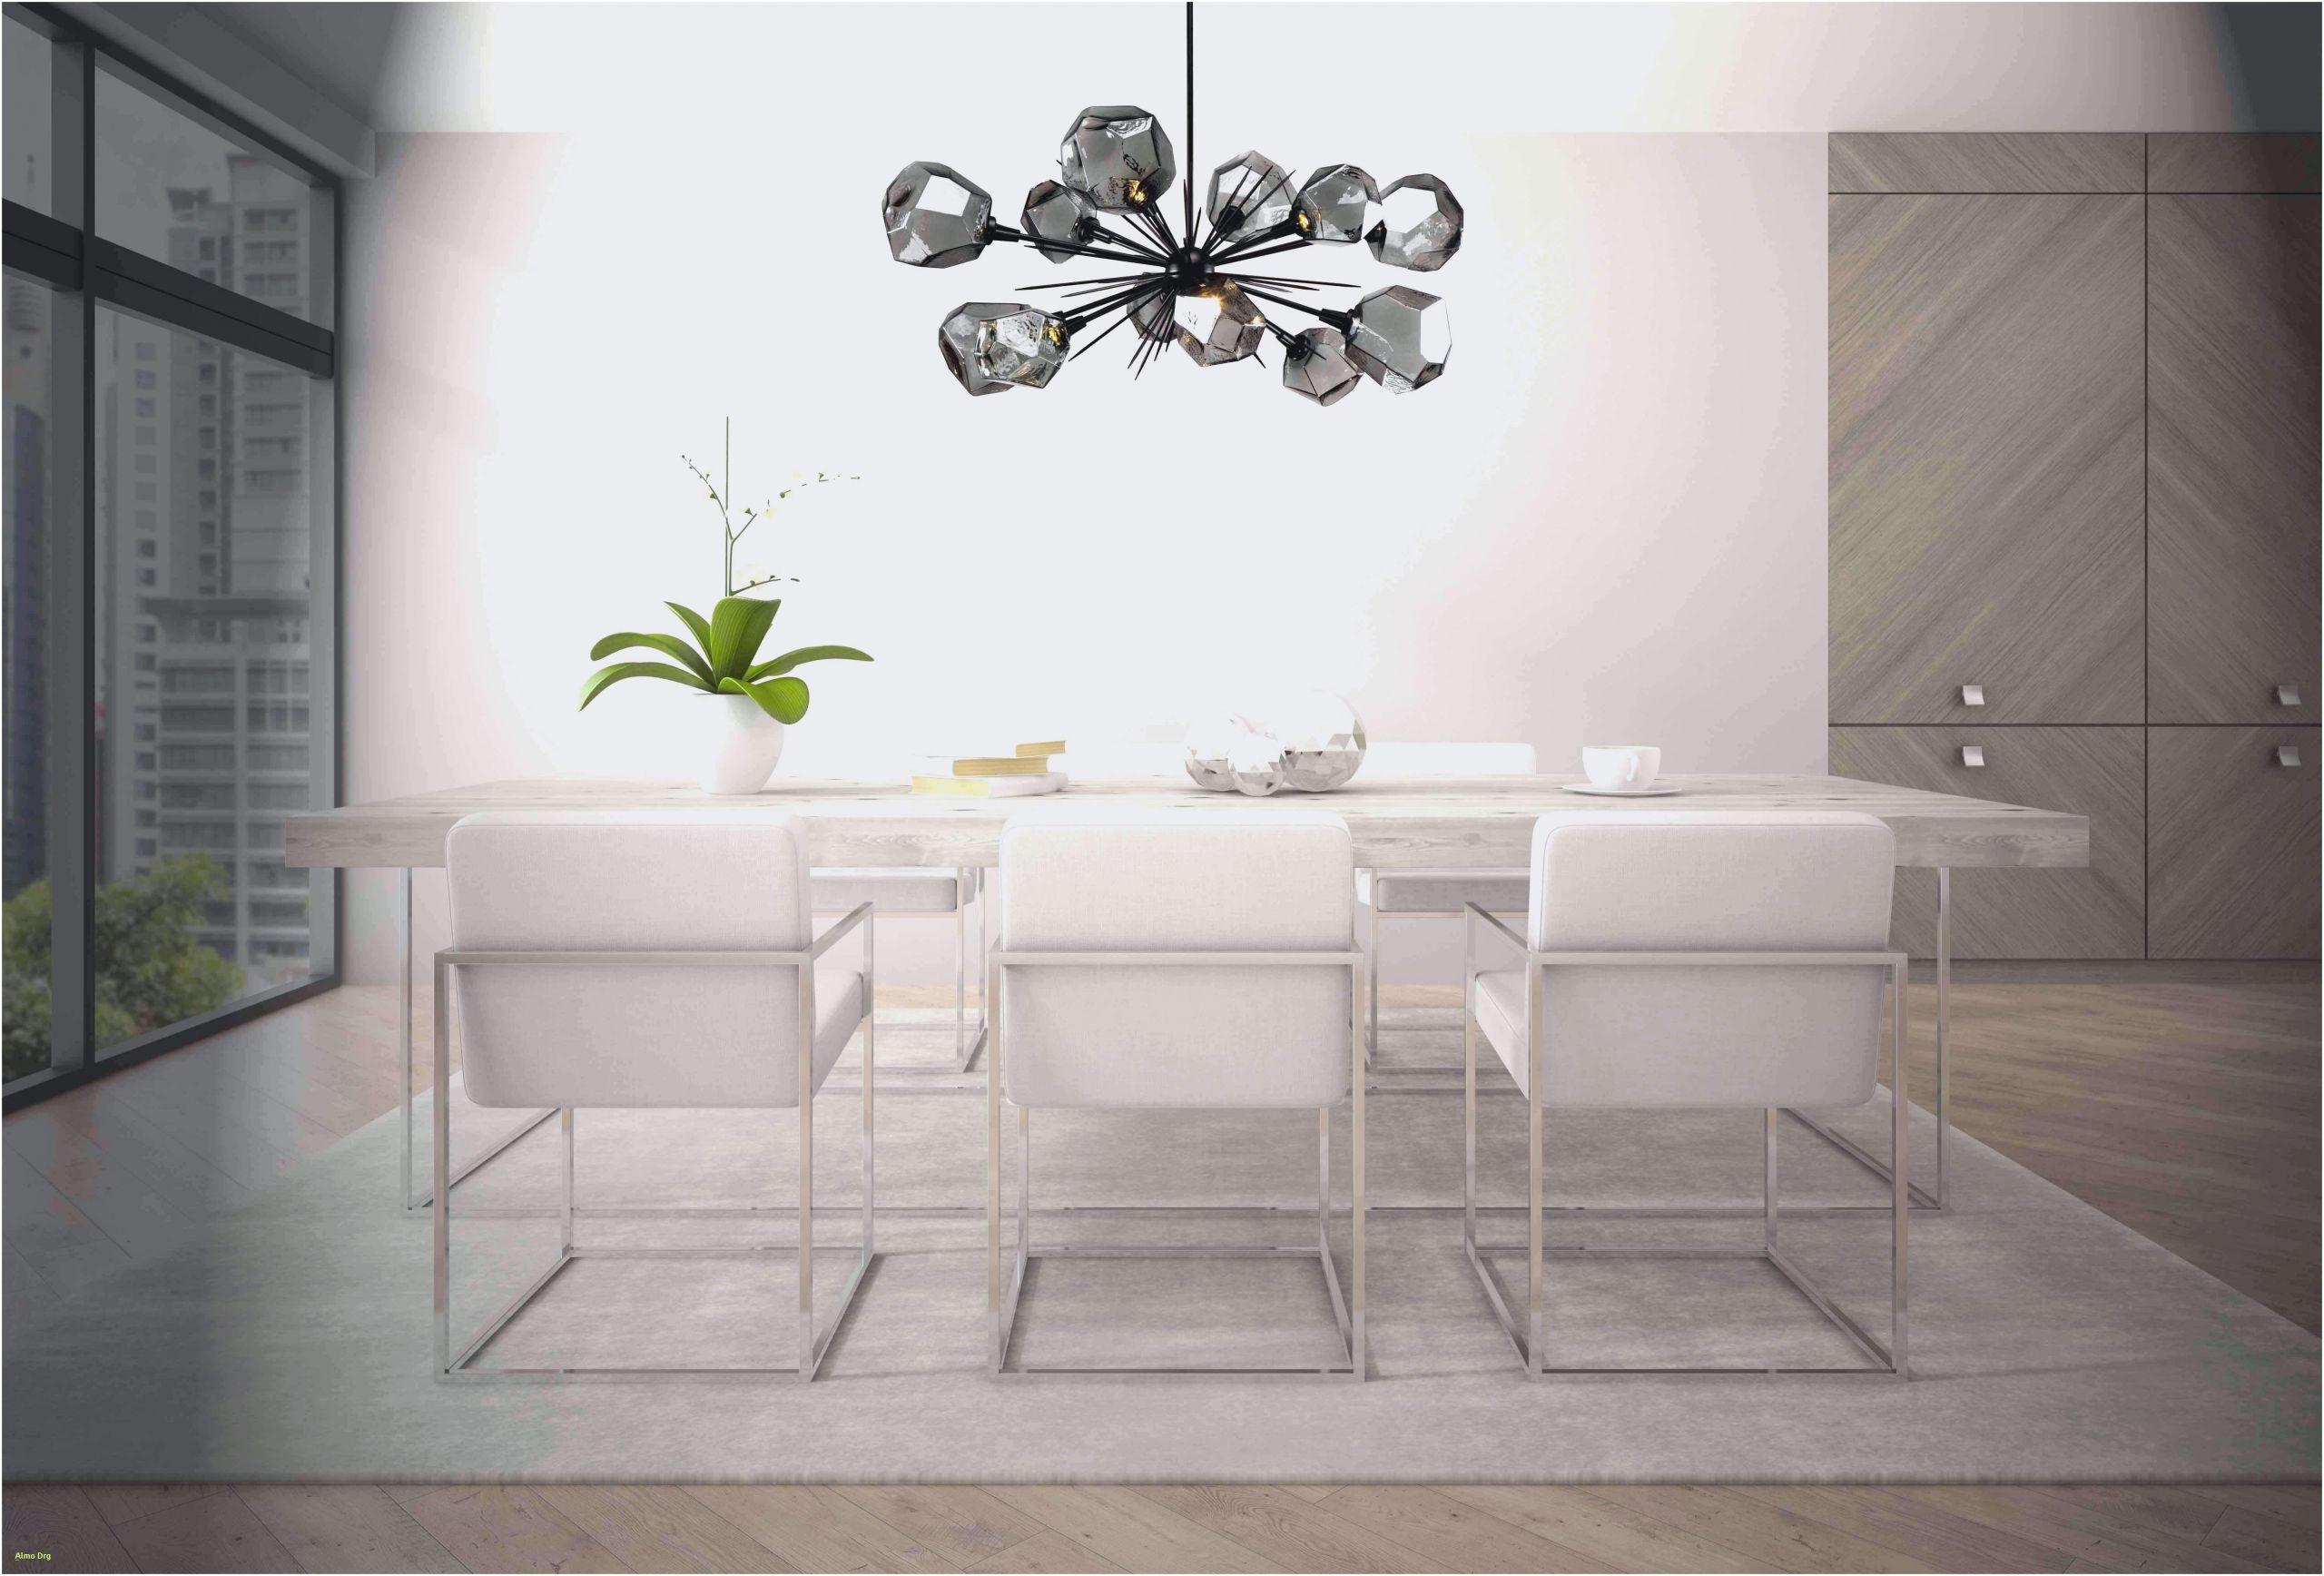 wohnzimmer ikea elegant luxe led lampe badezimmer bestevon wohnzimmer licht 0d of wohnzimmer ikea scaled